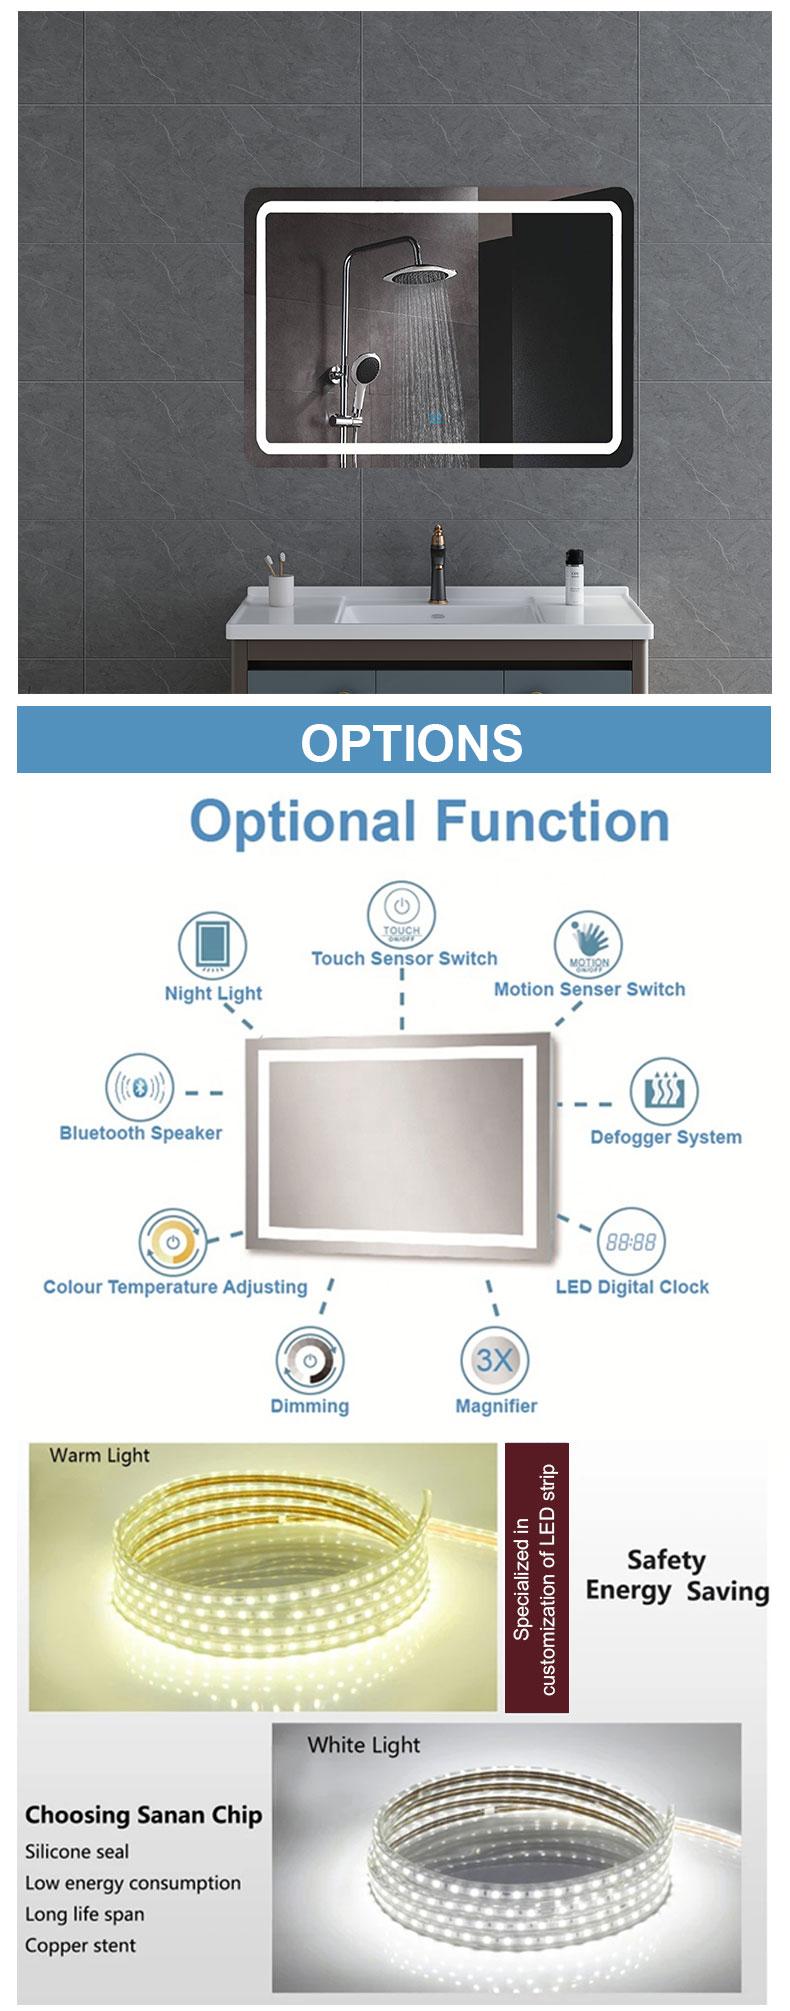 Bathroom LED mirror internal lighted manufacturers